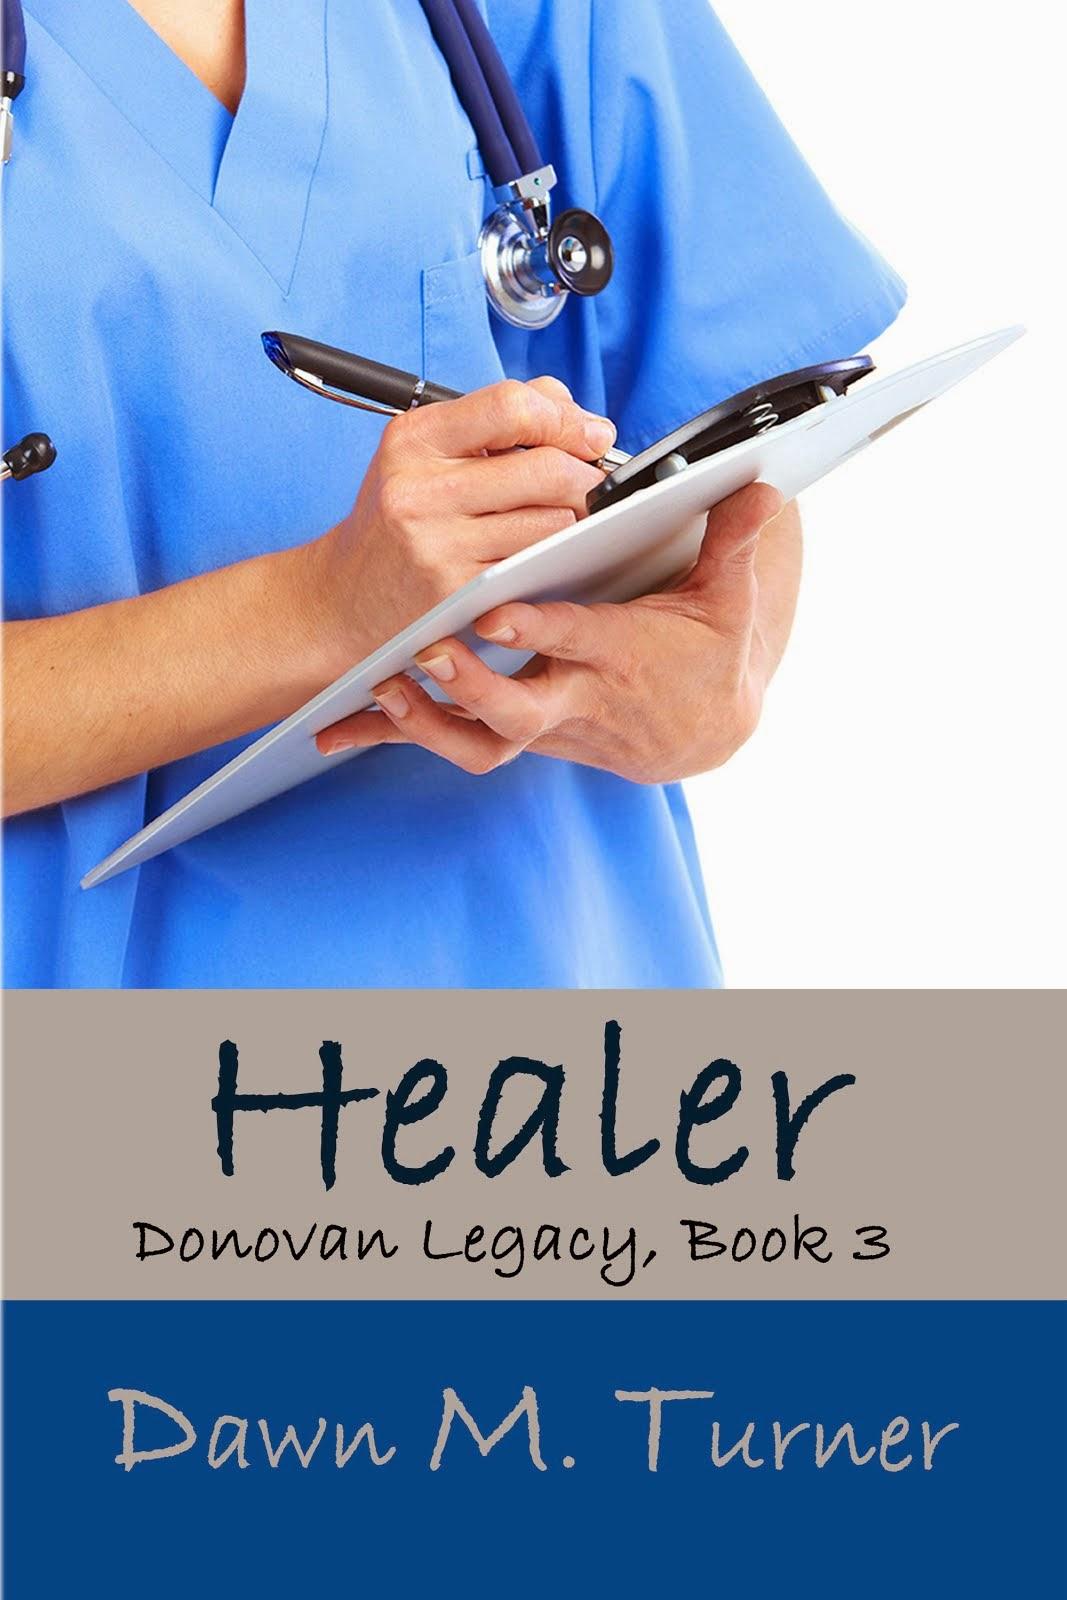 Healer - Donovan Legacy Book 3